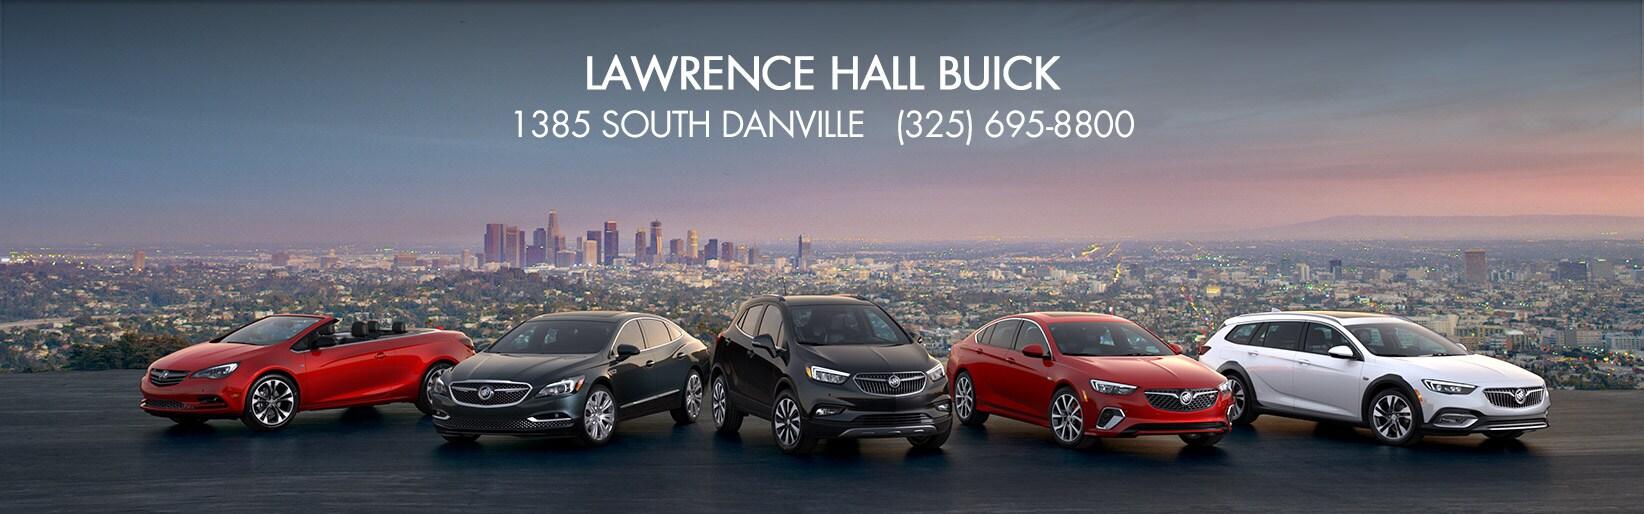 Lawrence Hall Used Cars Abilene Tx >> Lawrence Hall Abilene New Mazda Gmc Volkswagen Buick Lincoln